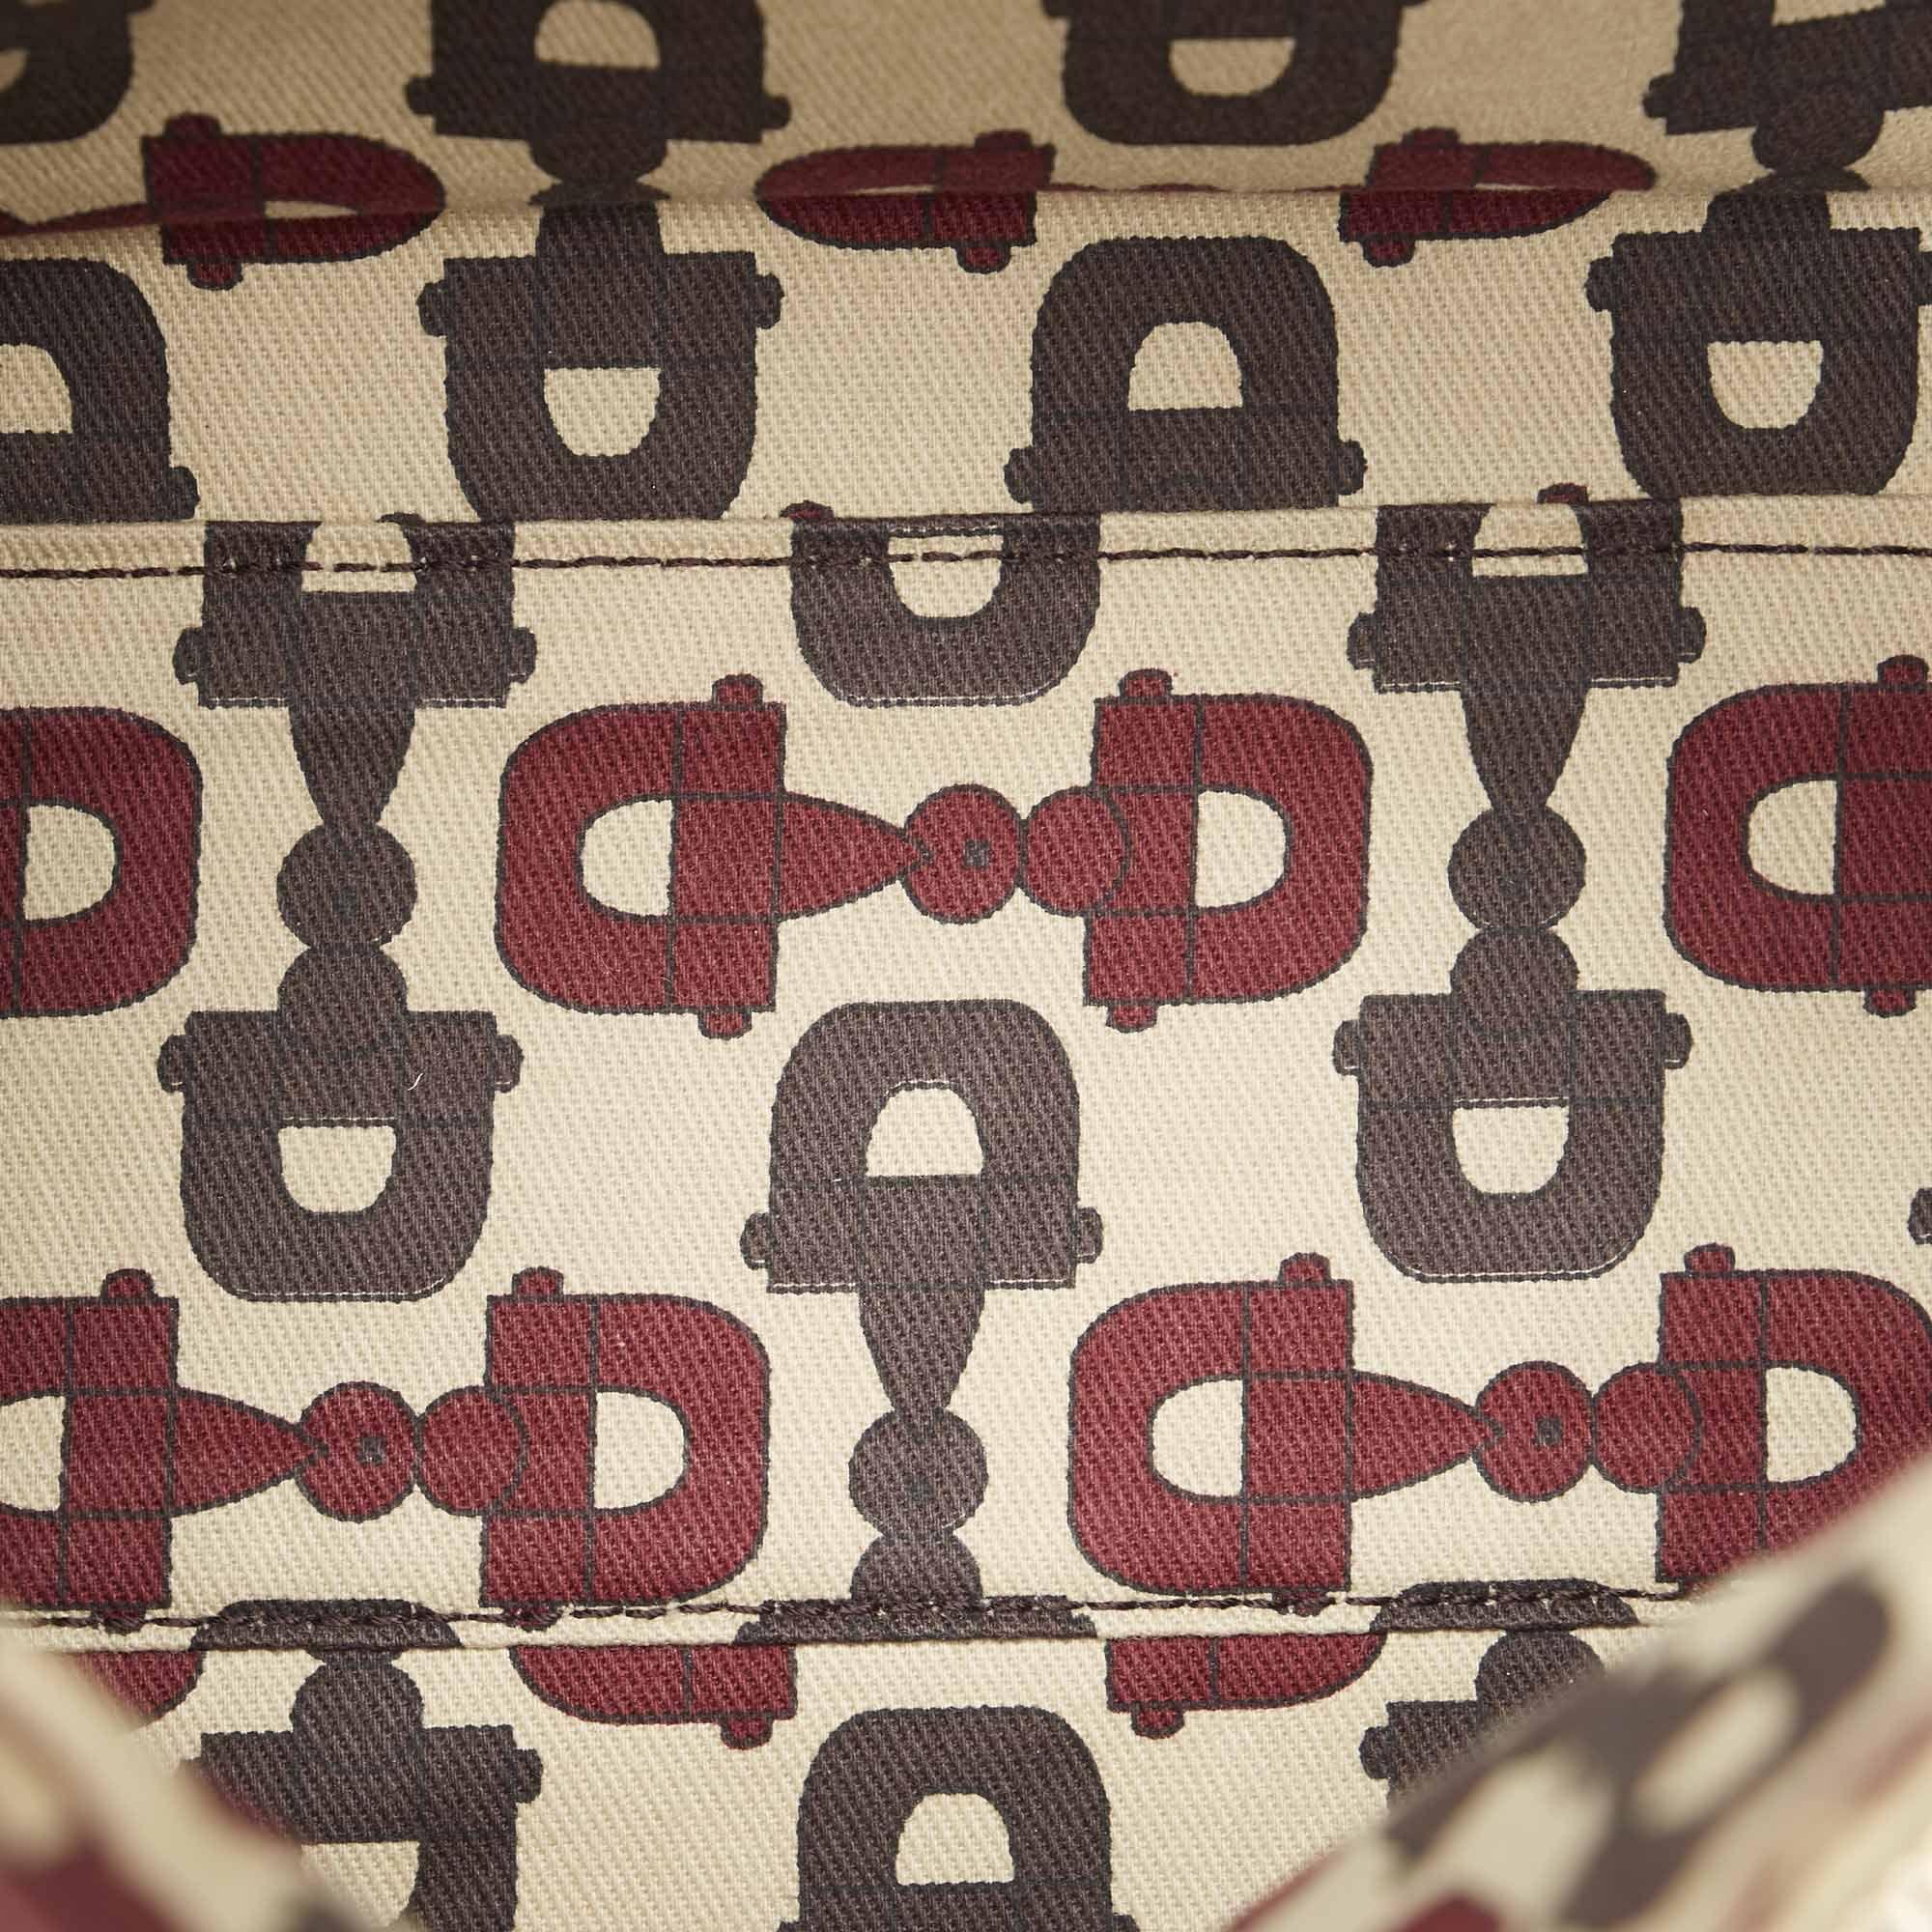 Vintage Gucci Guccissima Abbey Leather Boston Bag Brown